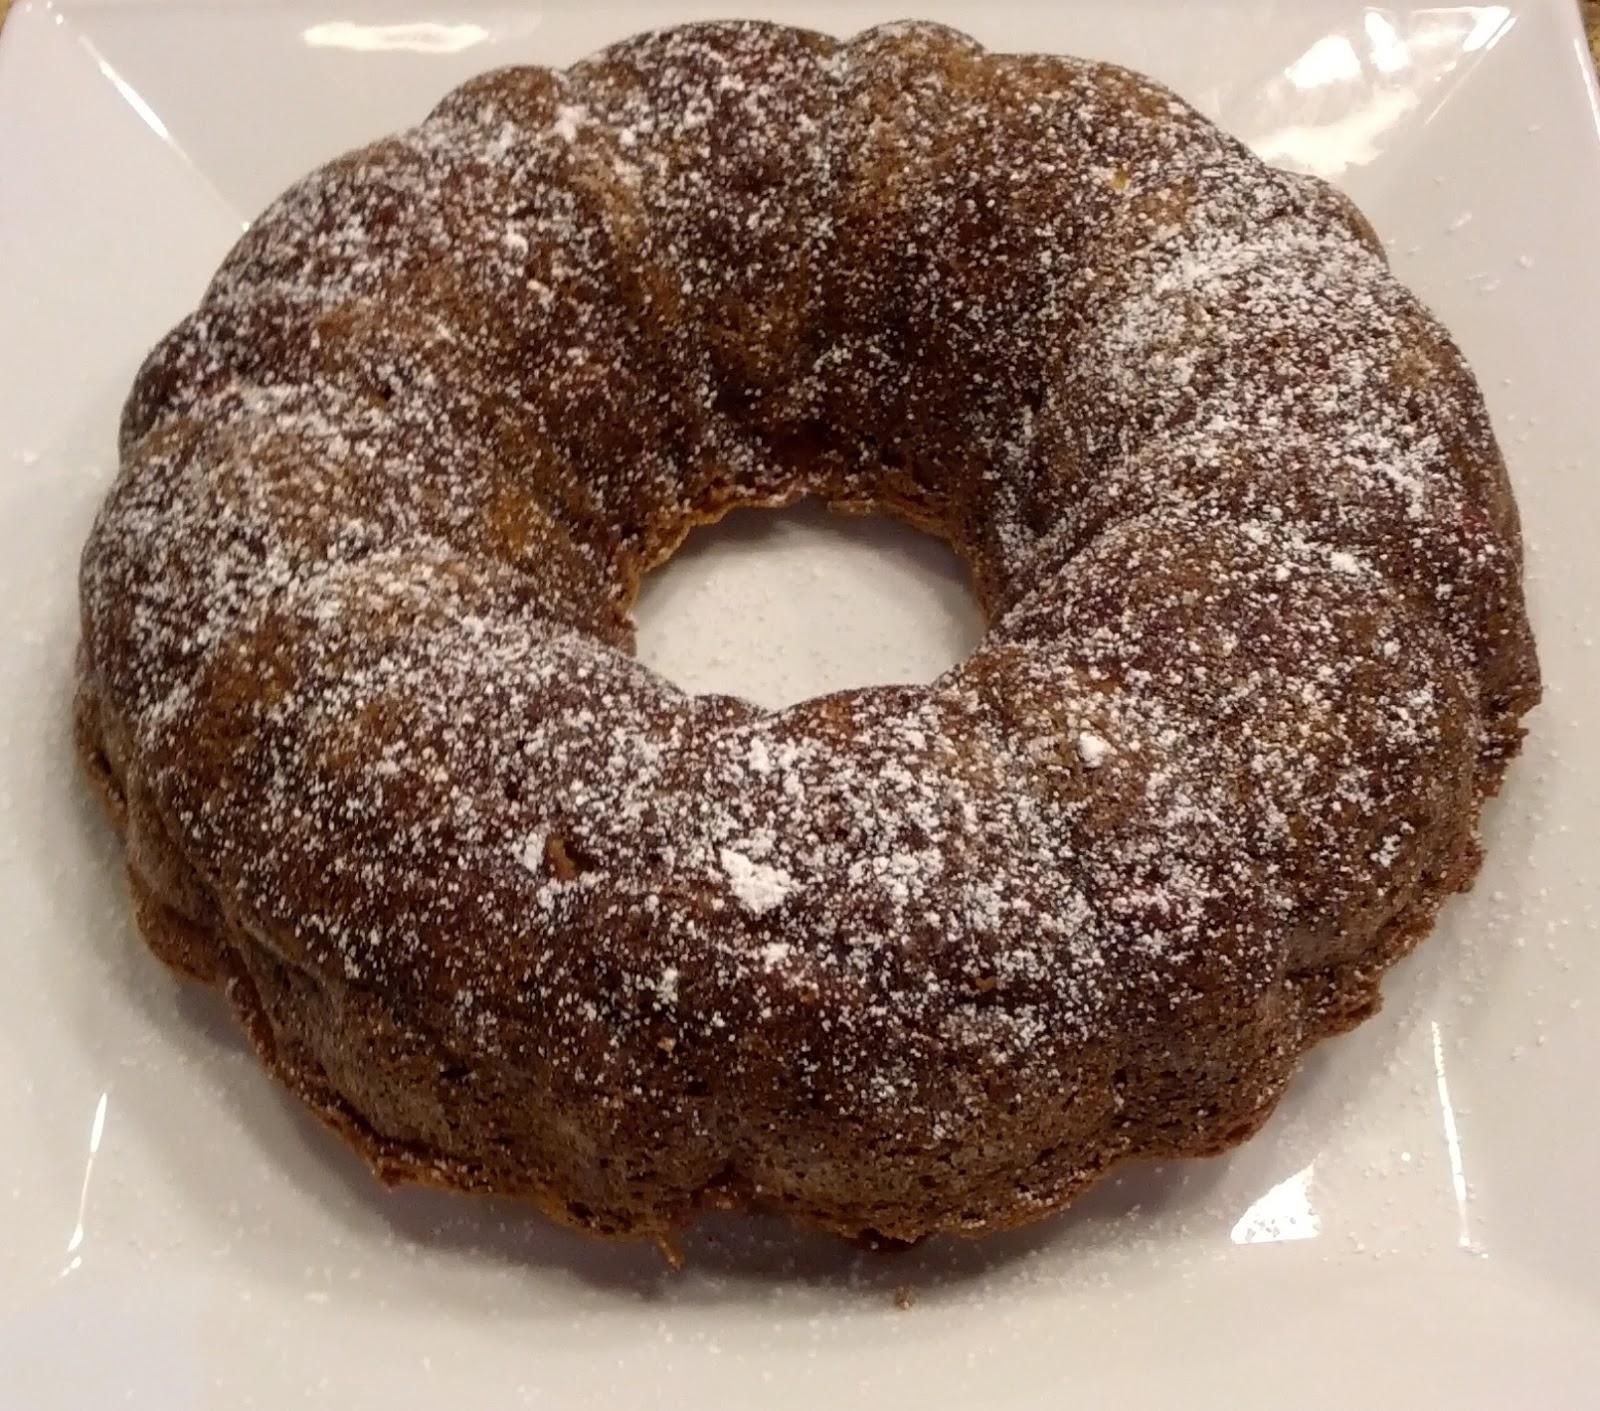 Yipson Foods Recipes and Blog: Apple Season = German Apple Cake